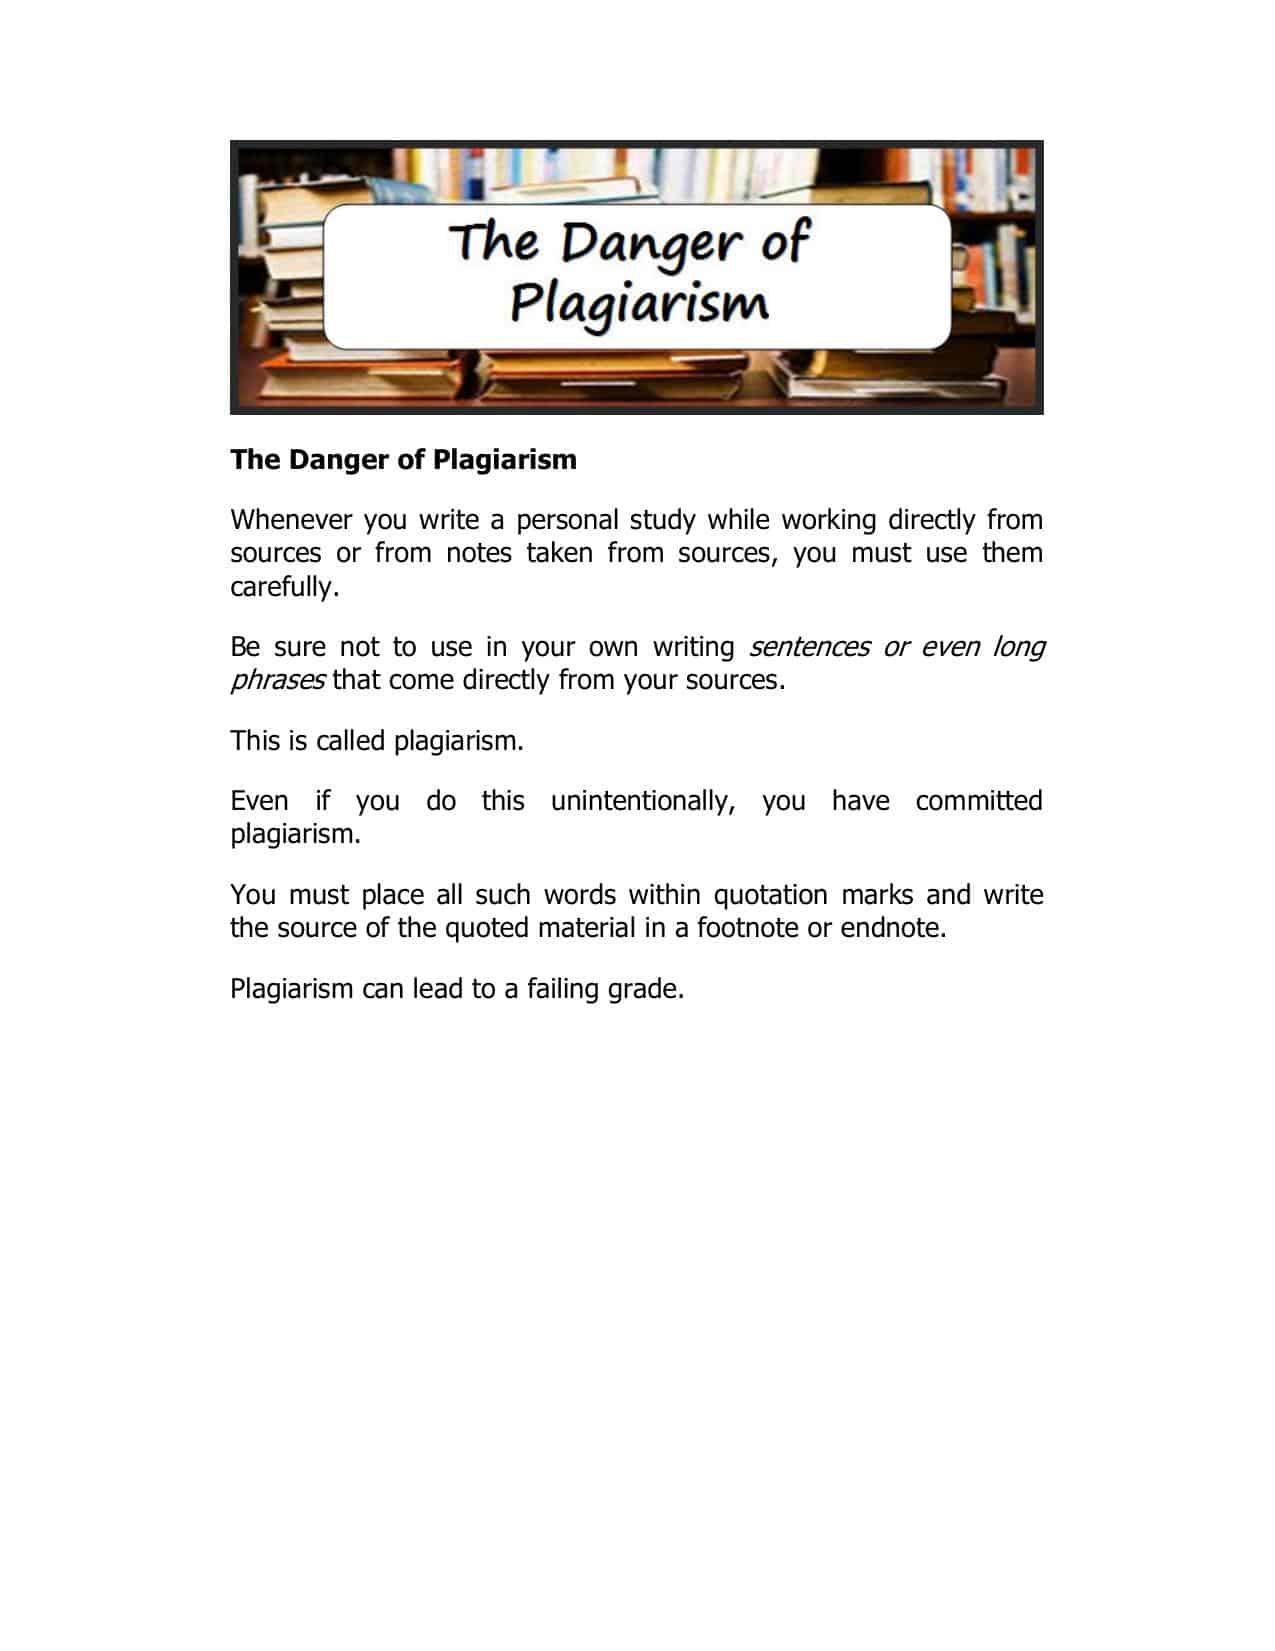 The Danger Of Plagiarism Worksheet